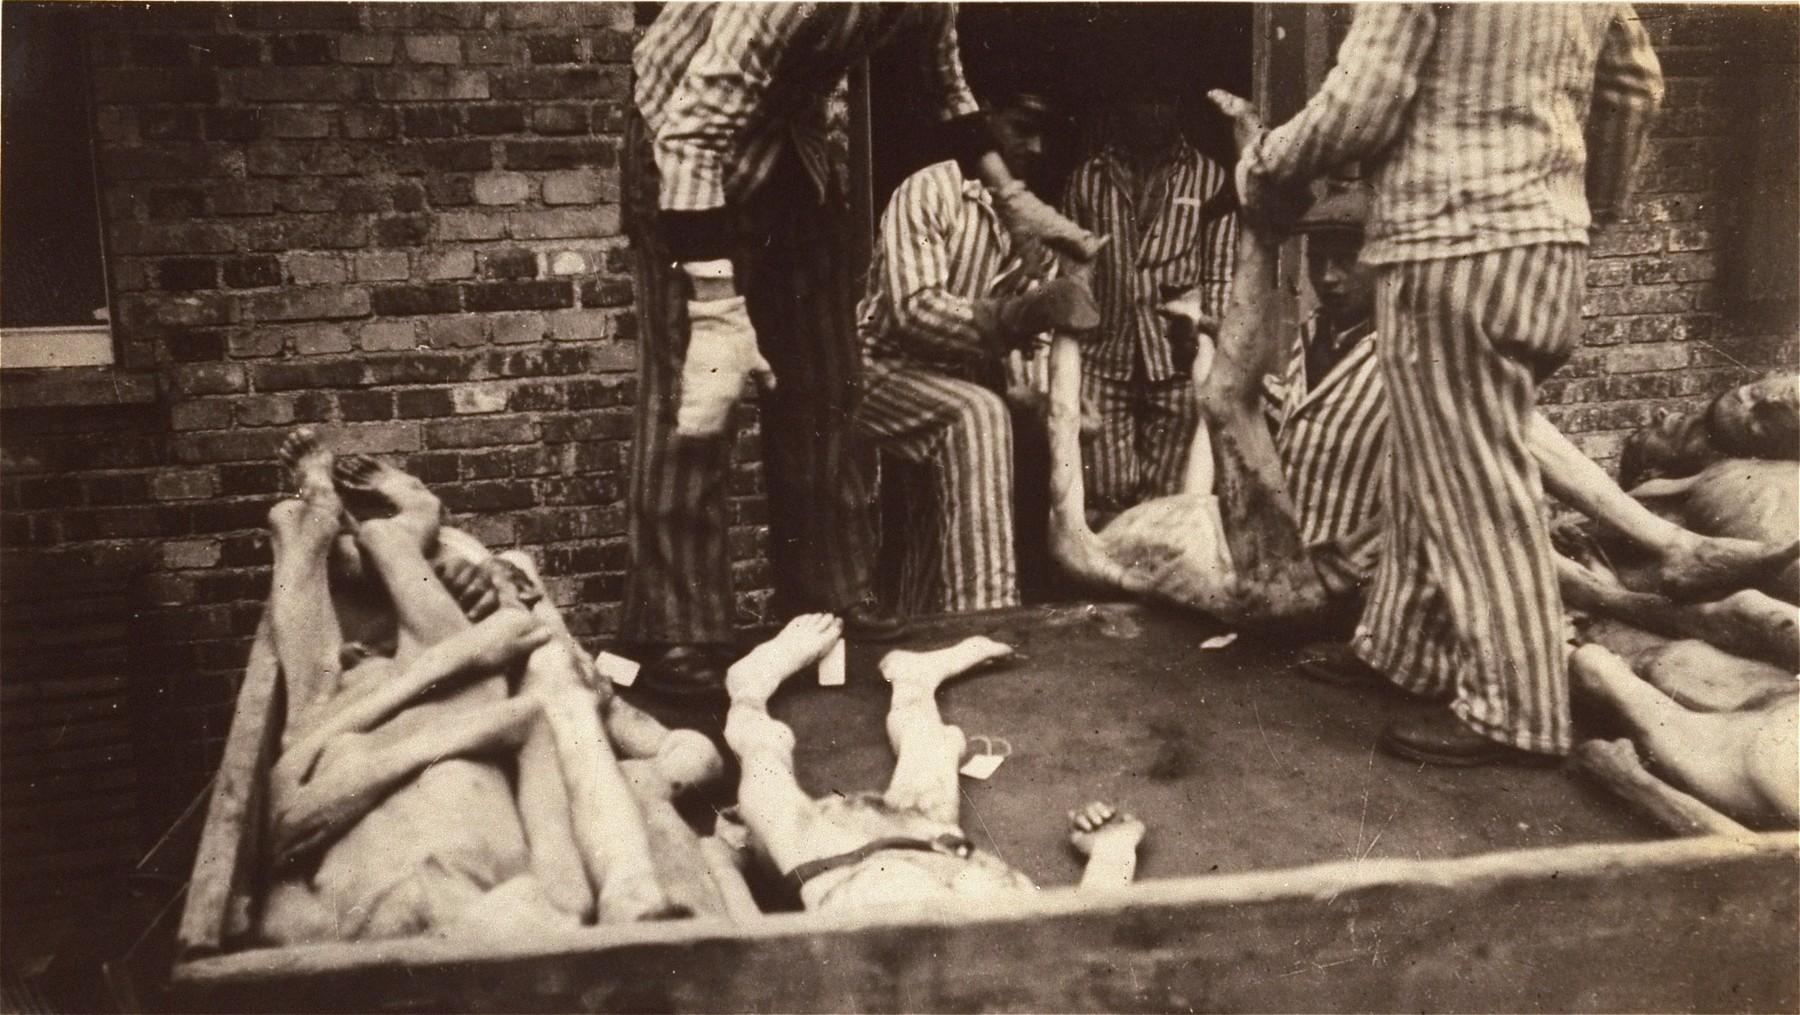 Survivors in Dachau remove bodies from the cellar of the crematorium.